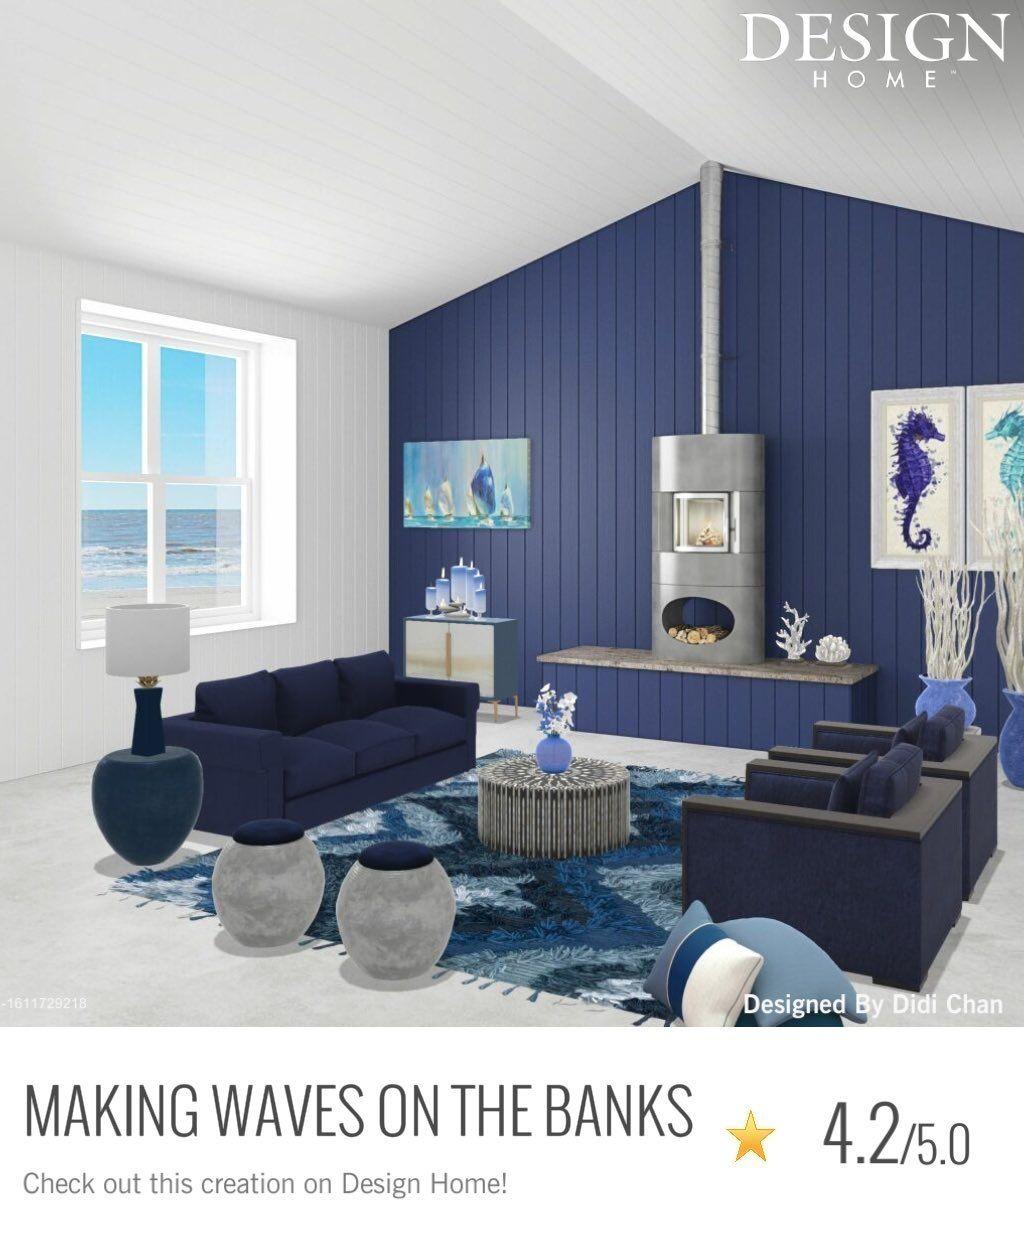 Tumblr Design Home App House Design Living Design Decorate living room app